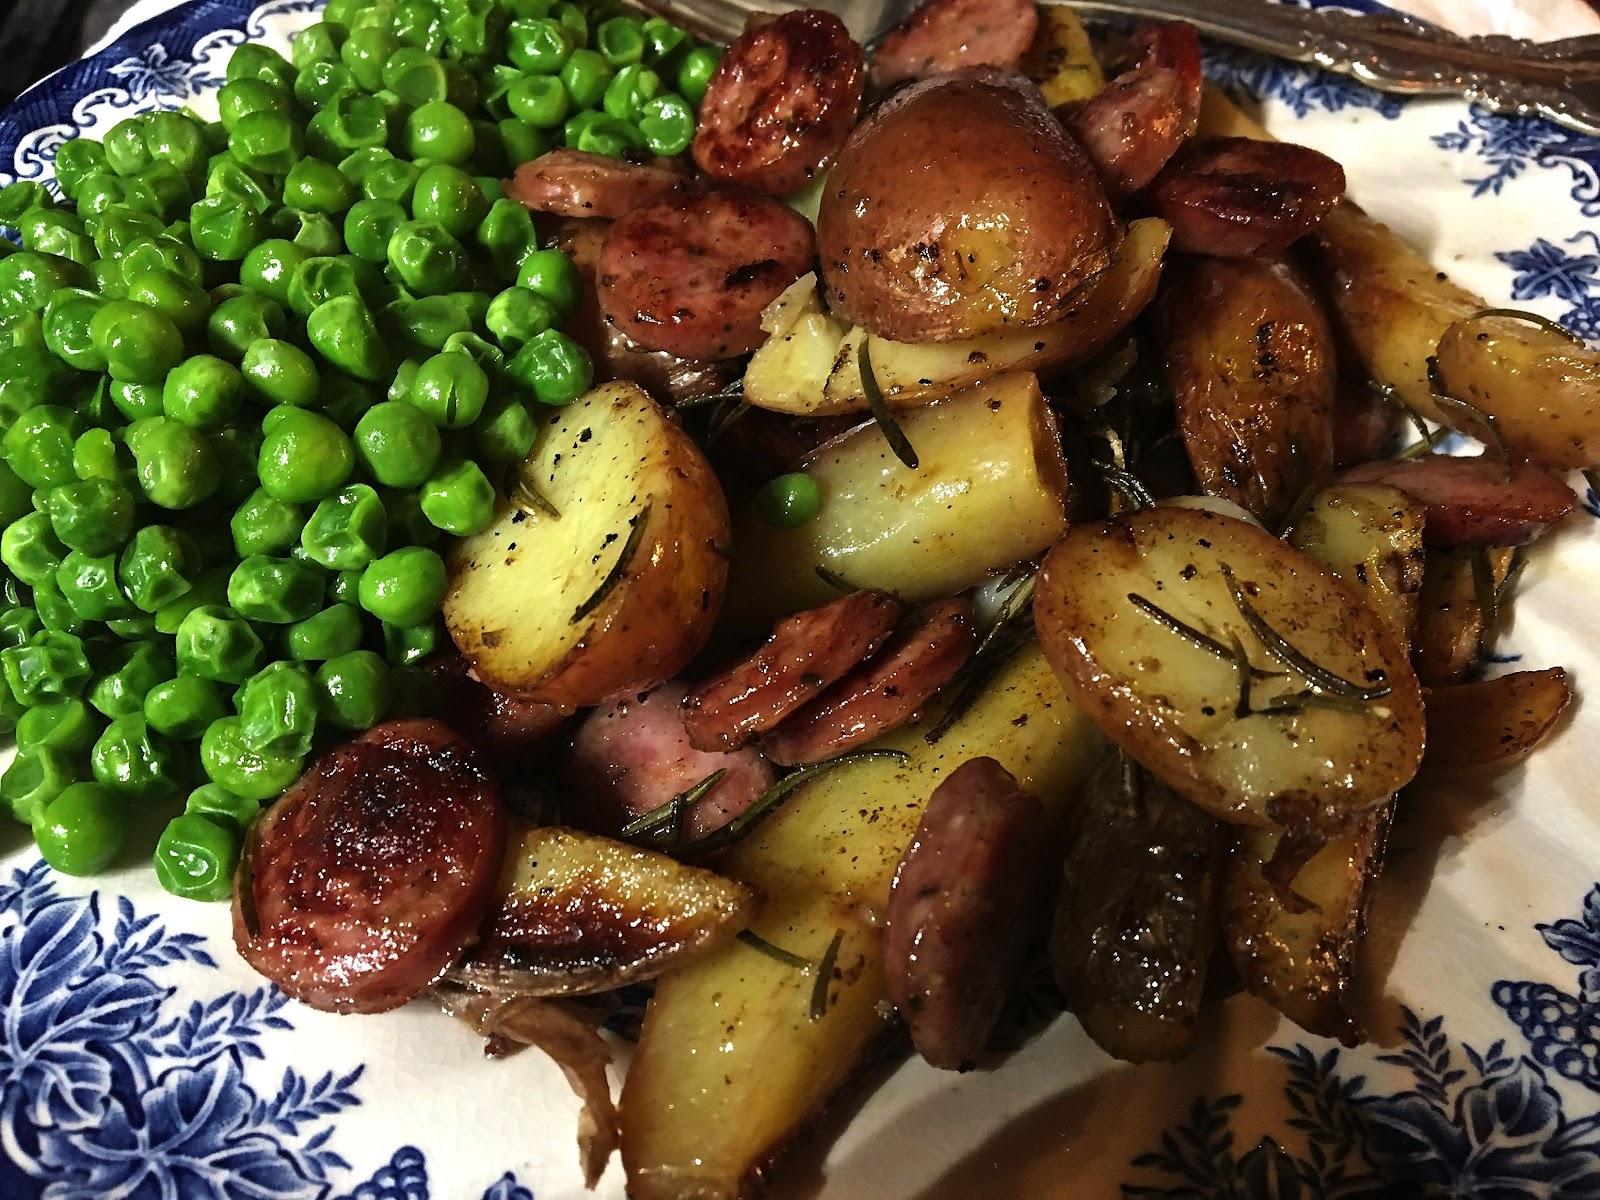 Potatoes and rosemary